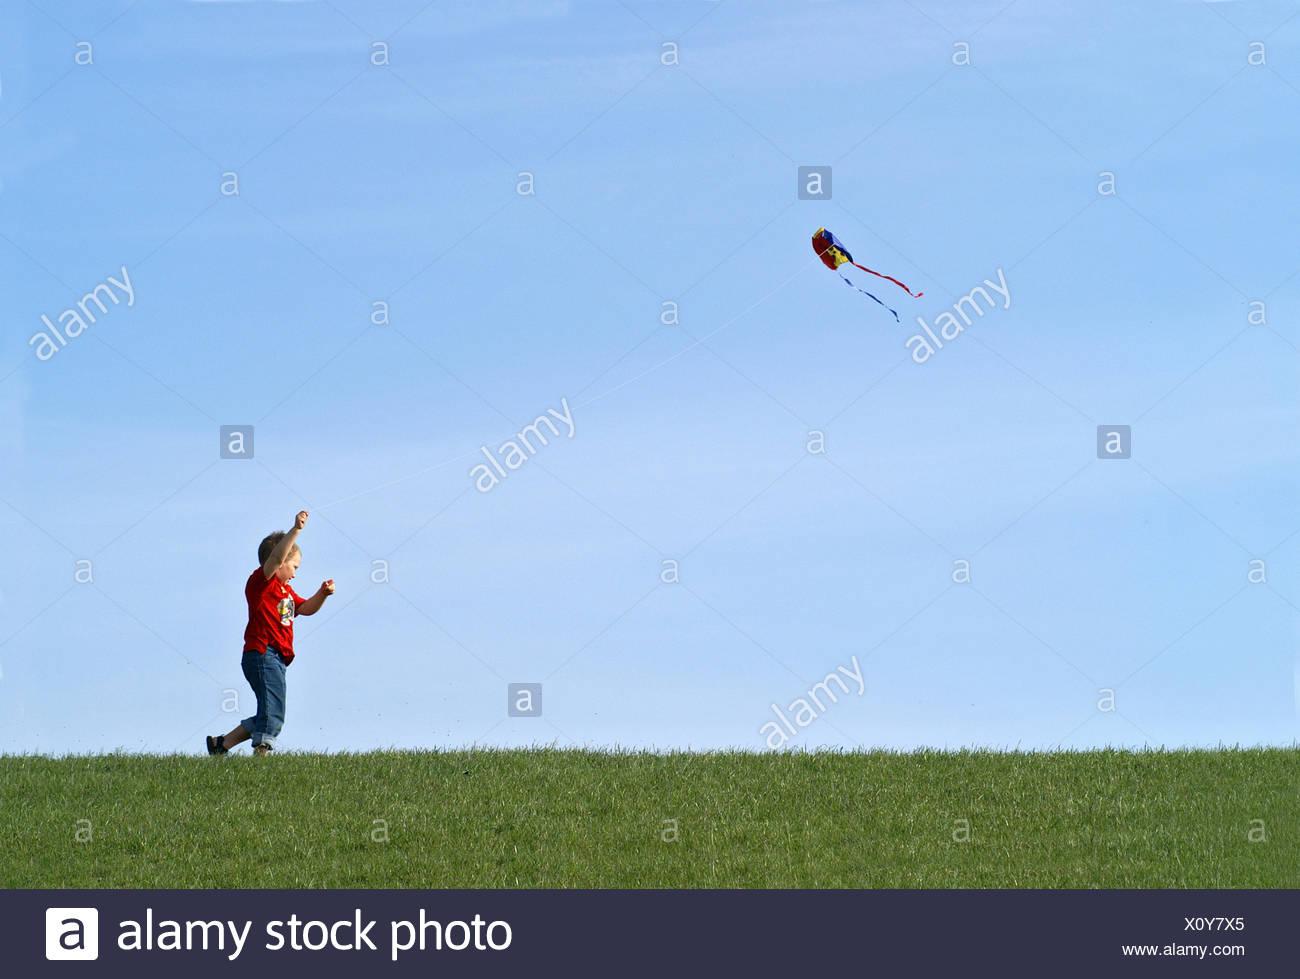 1 child,kite - Stock Image